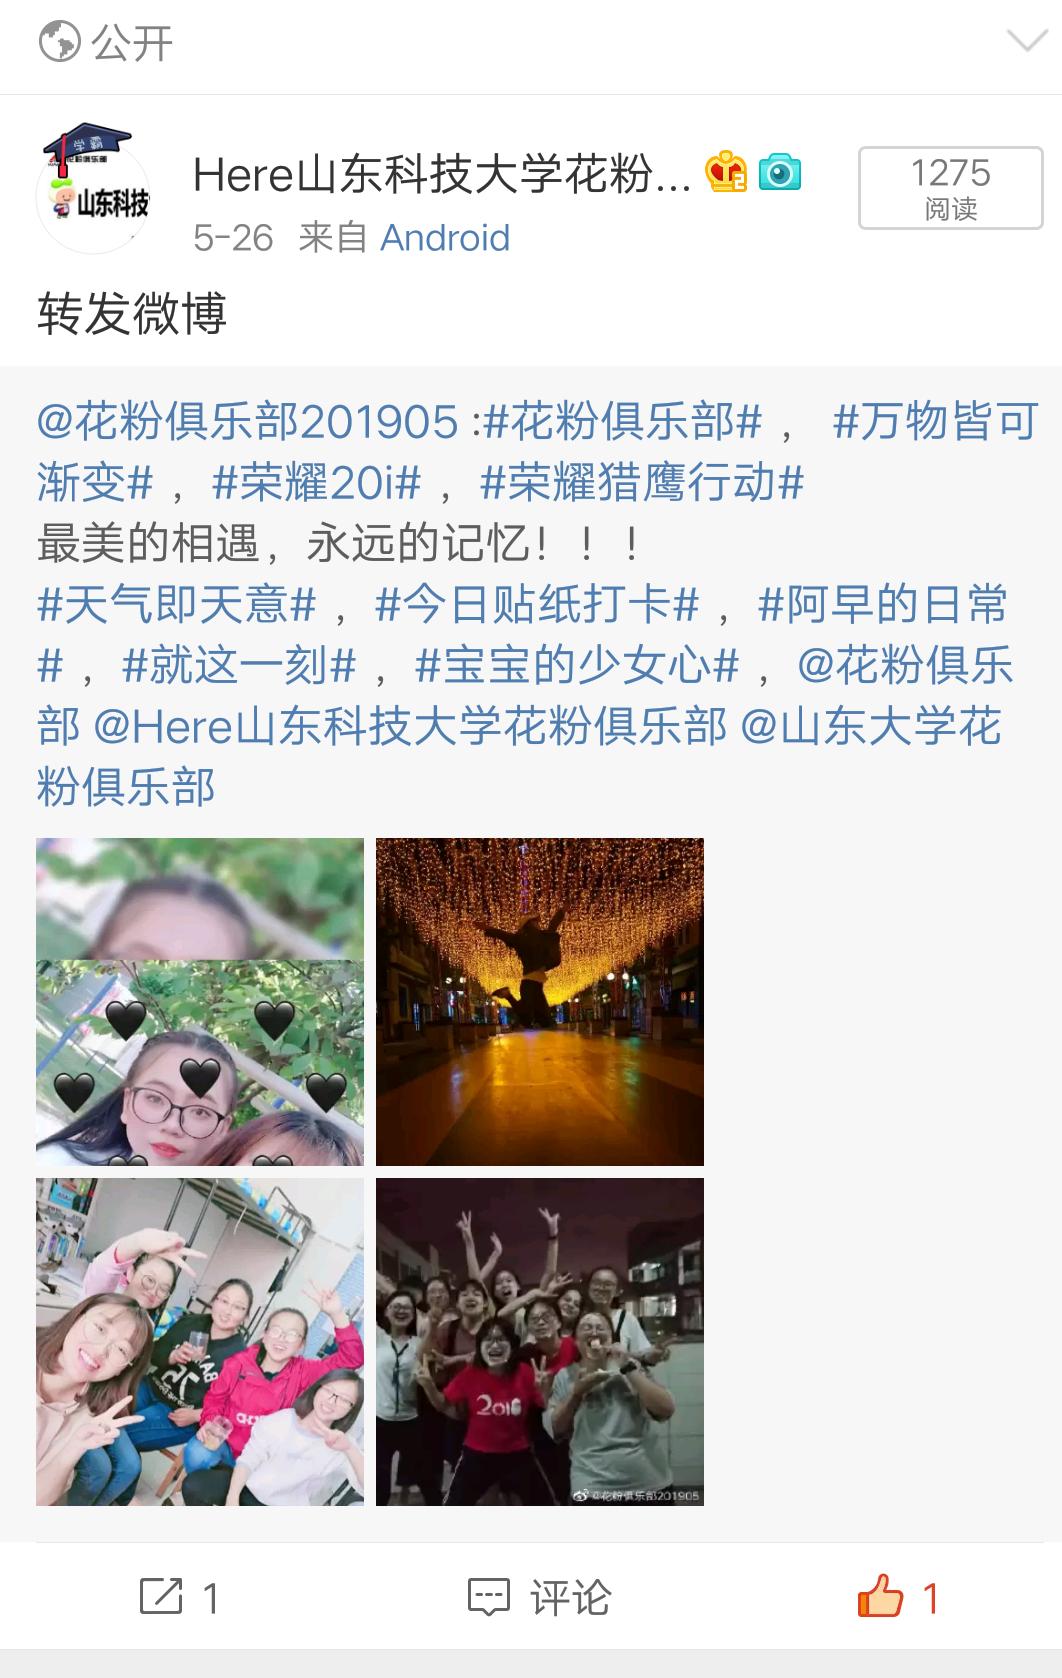 Screenshot_2019_0606_110151.png